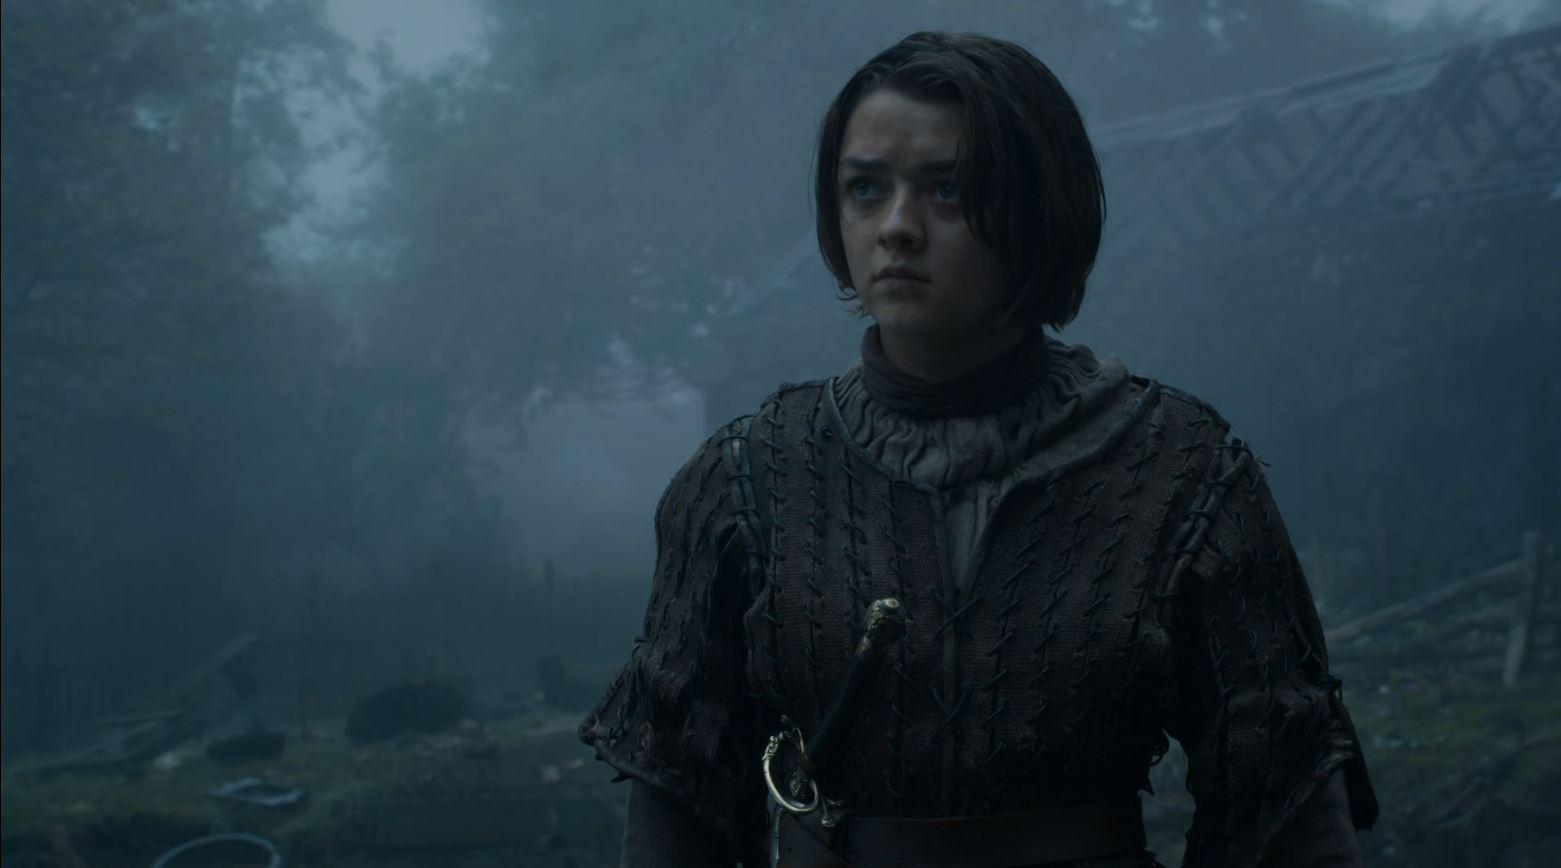 Game Of Thrones S4Ep7 Mockingbird Review - Maisie Williams as Arya Stark